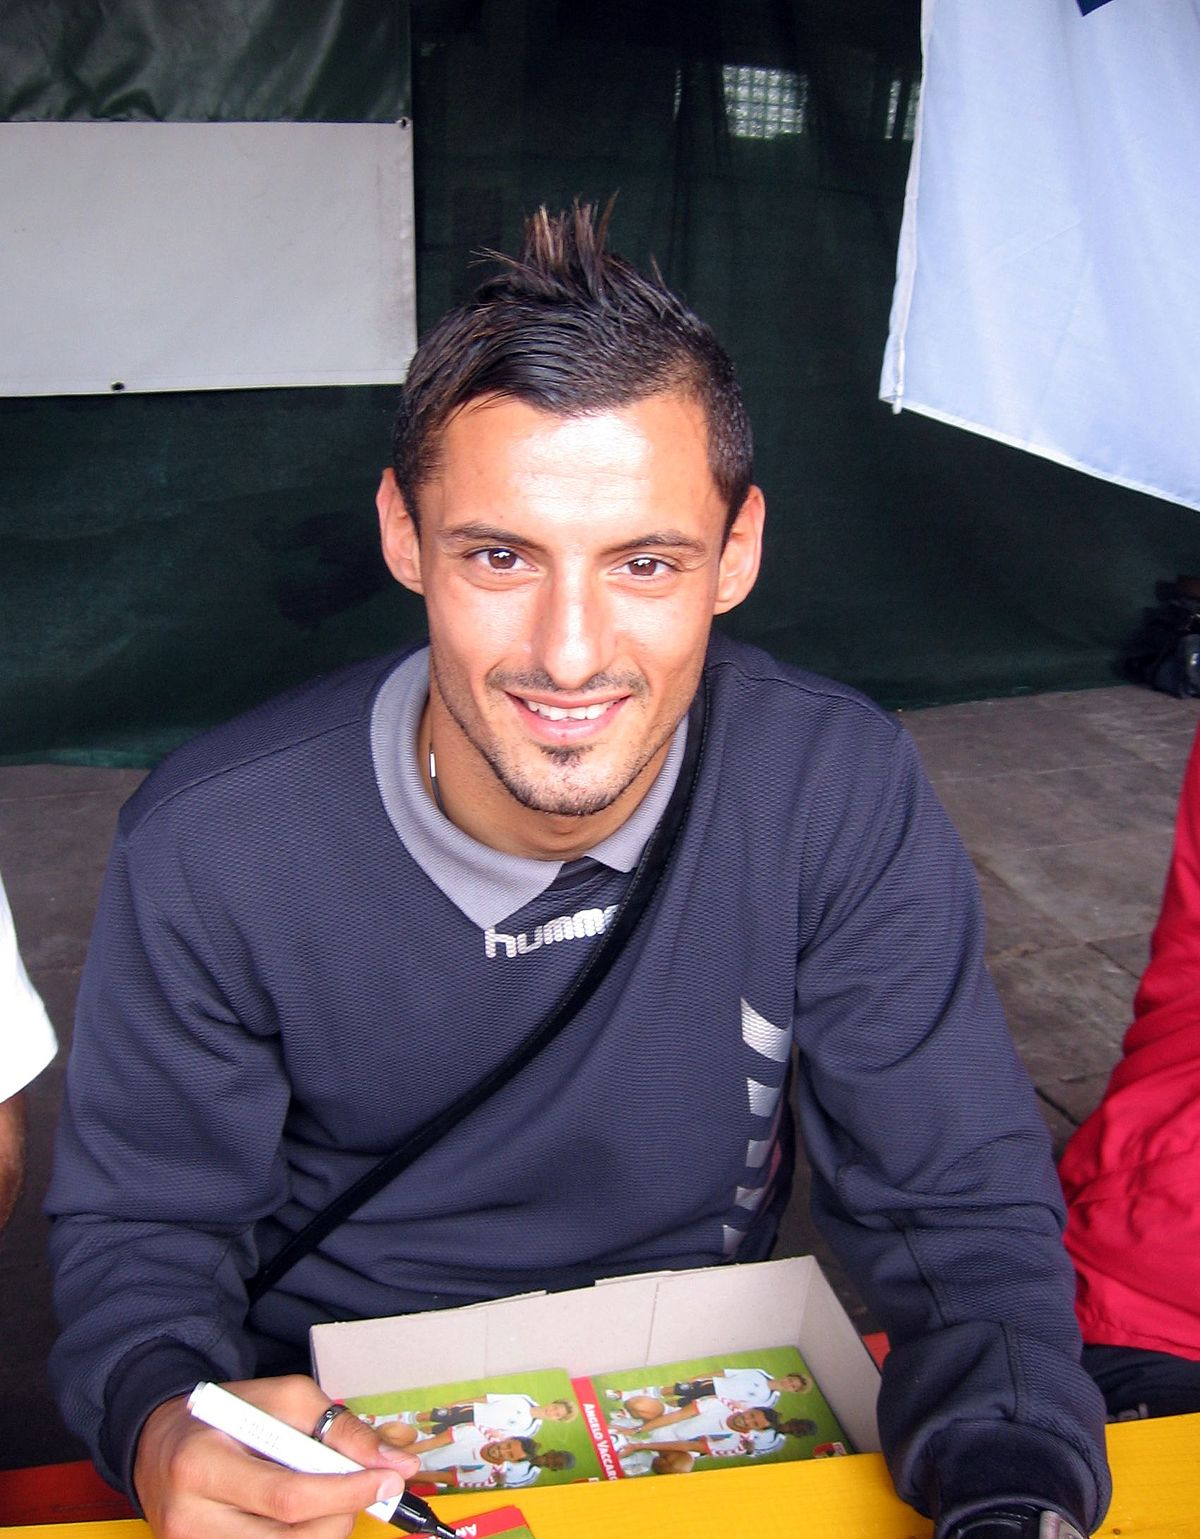 Angelo Vaccaro